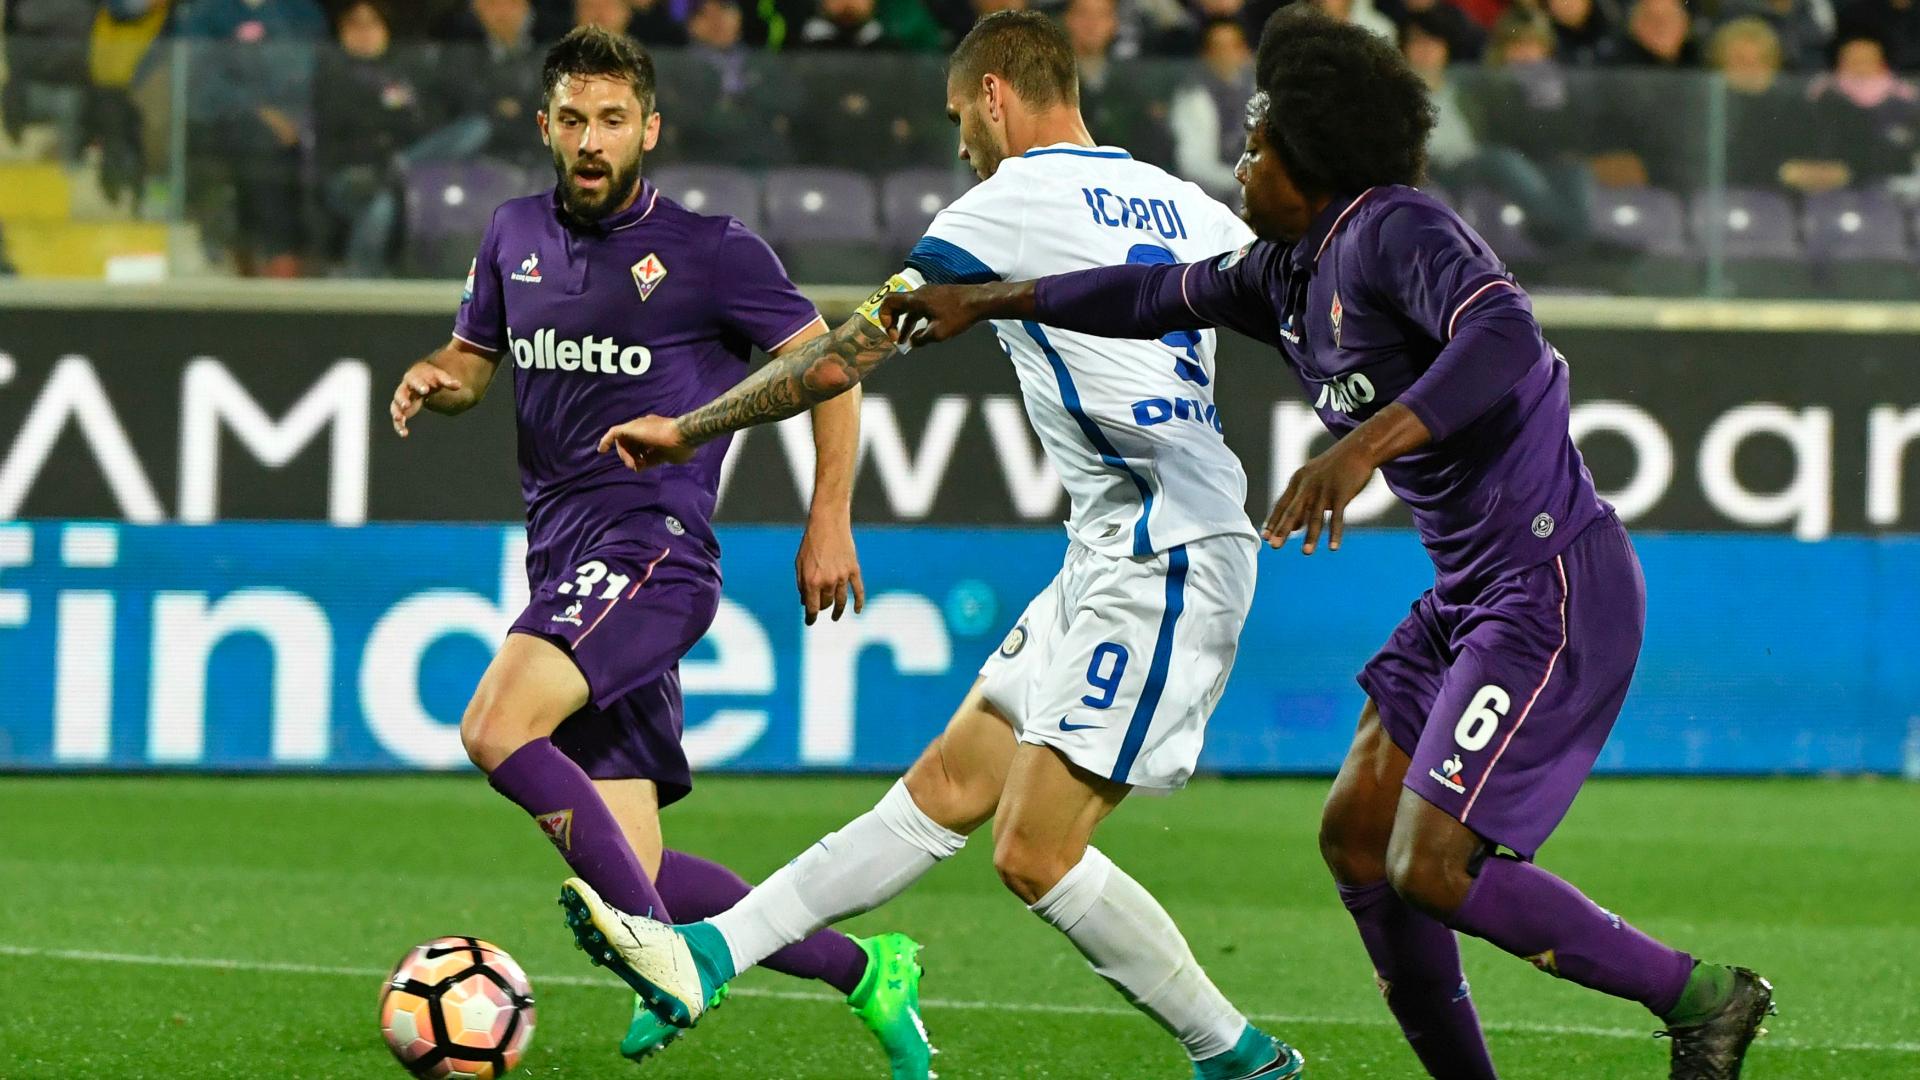 C'è Inter-Fiorentina, ma Morfeo è... con i dilettanti!